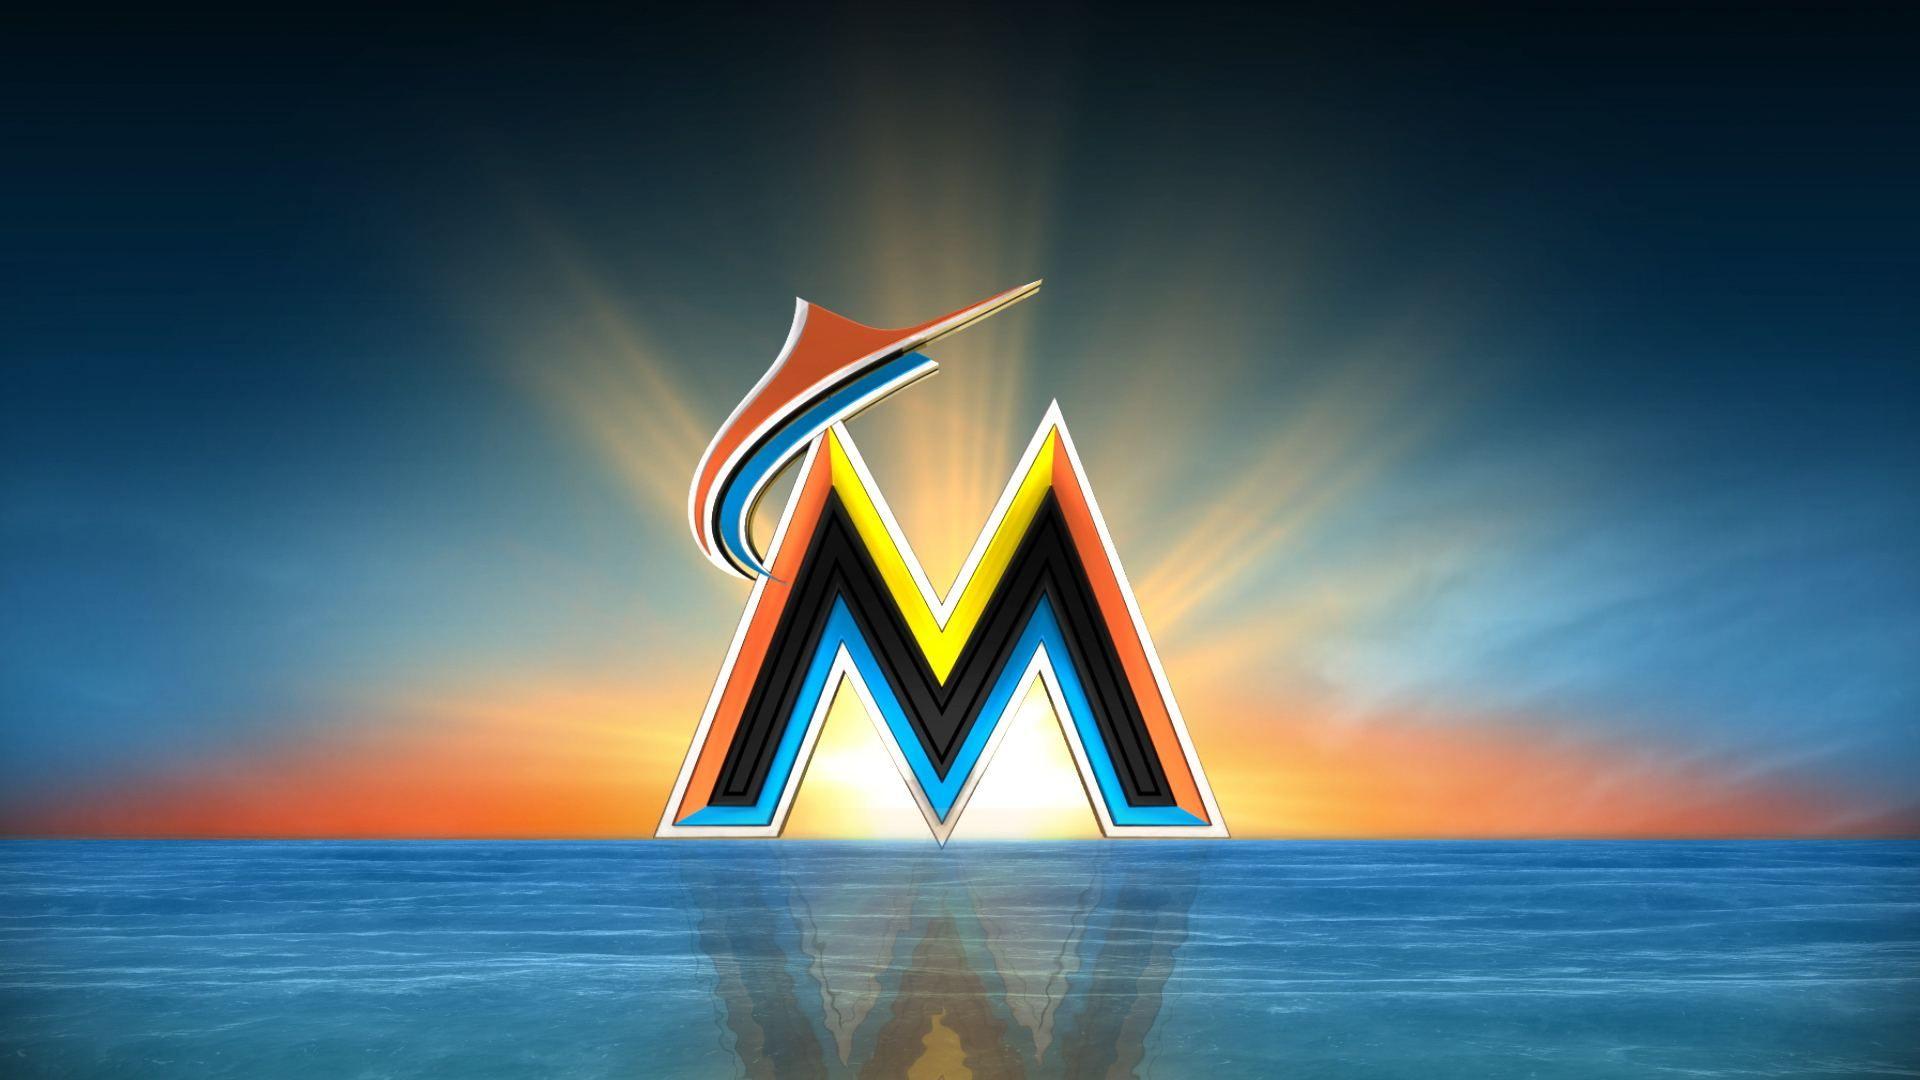 Miami Marlins Wallpapers